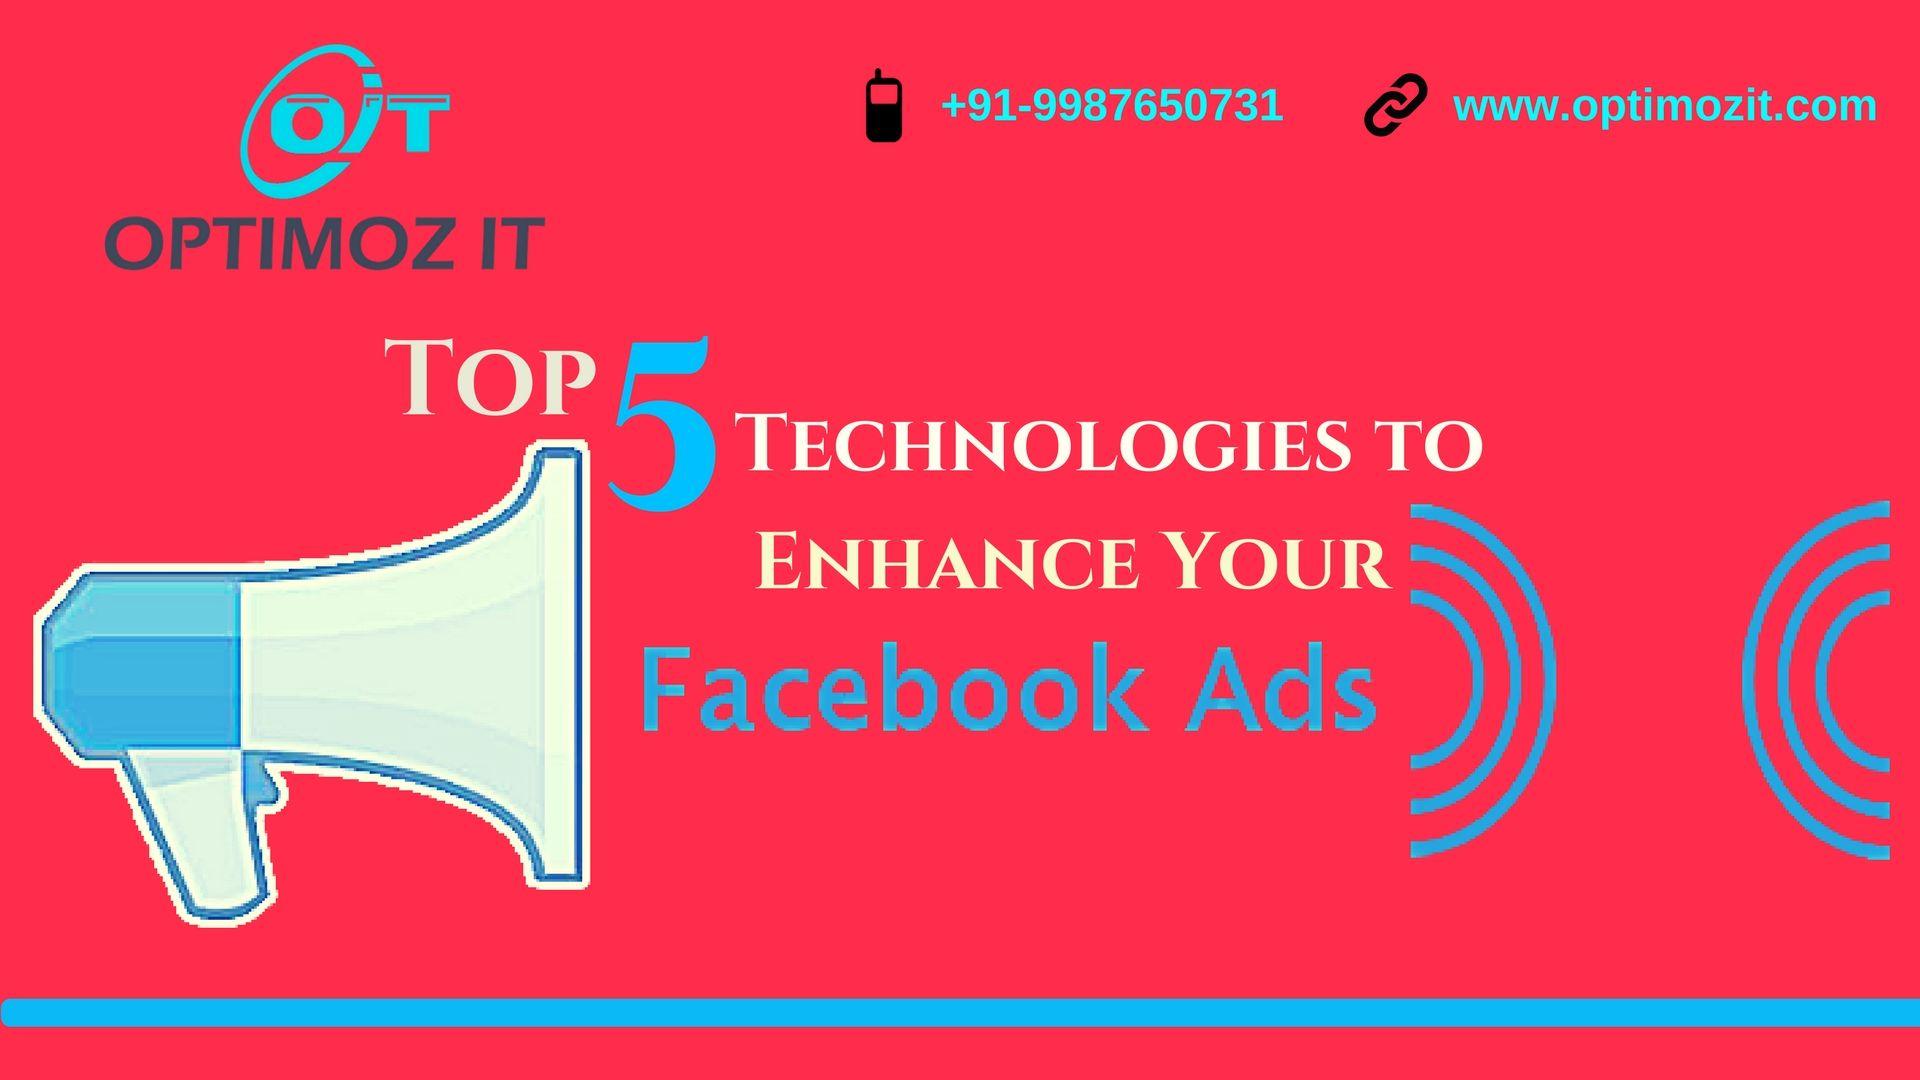 Facebook Ads - Top 5 Technologies to Enhance Facebook Ads ...